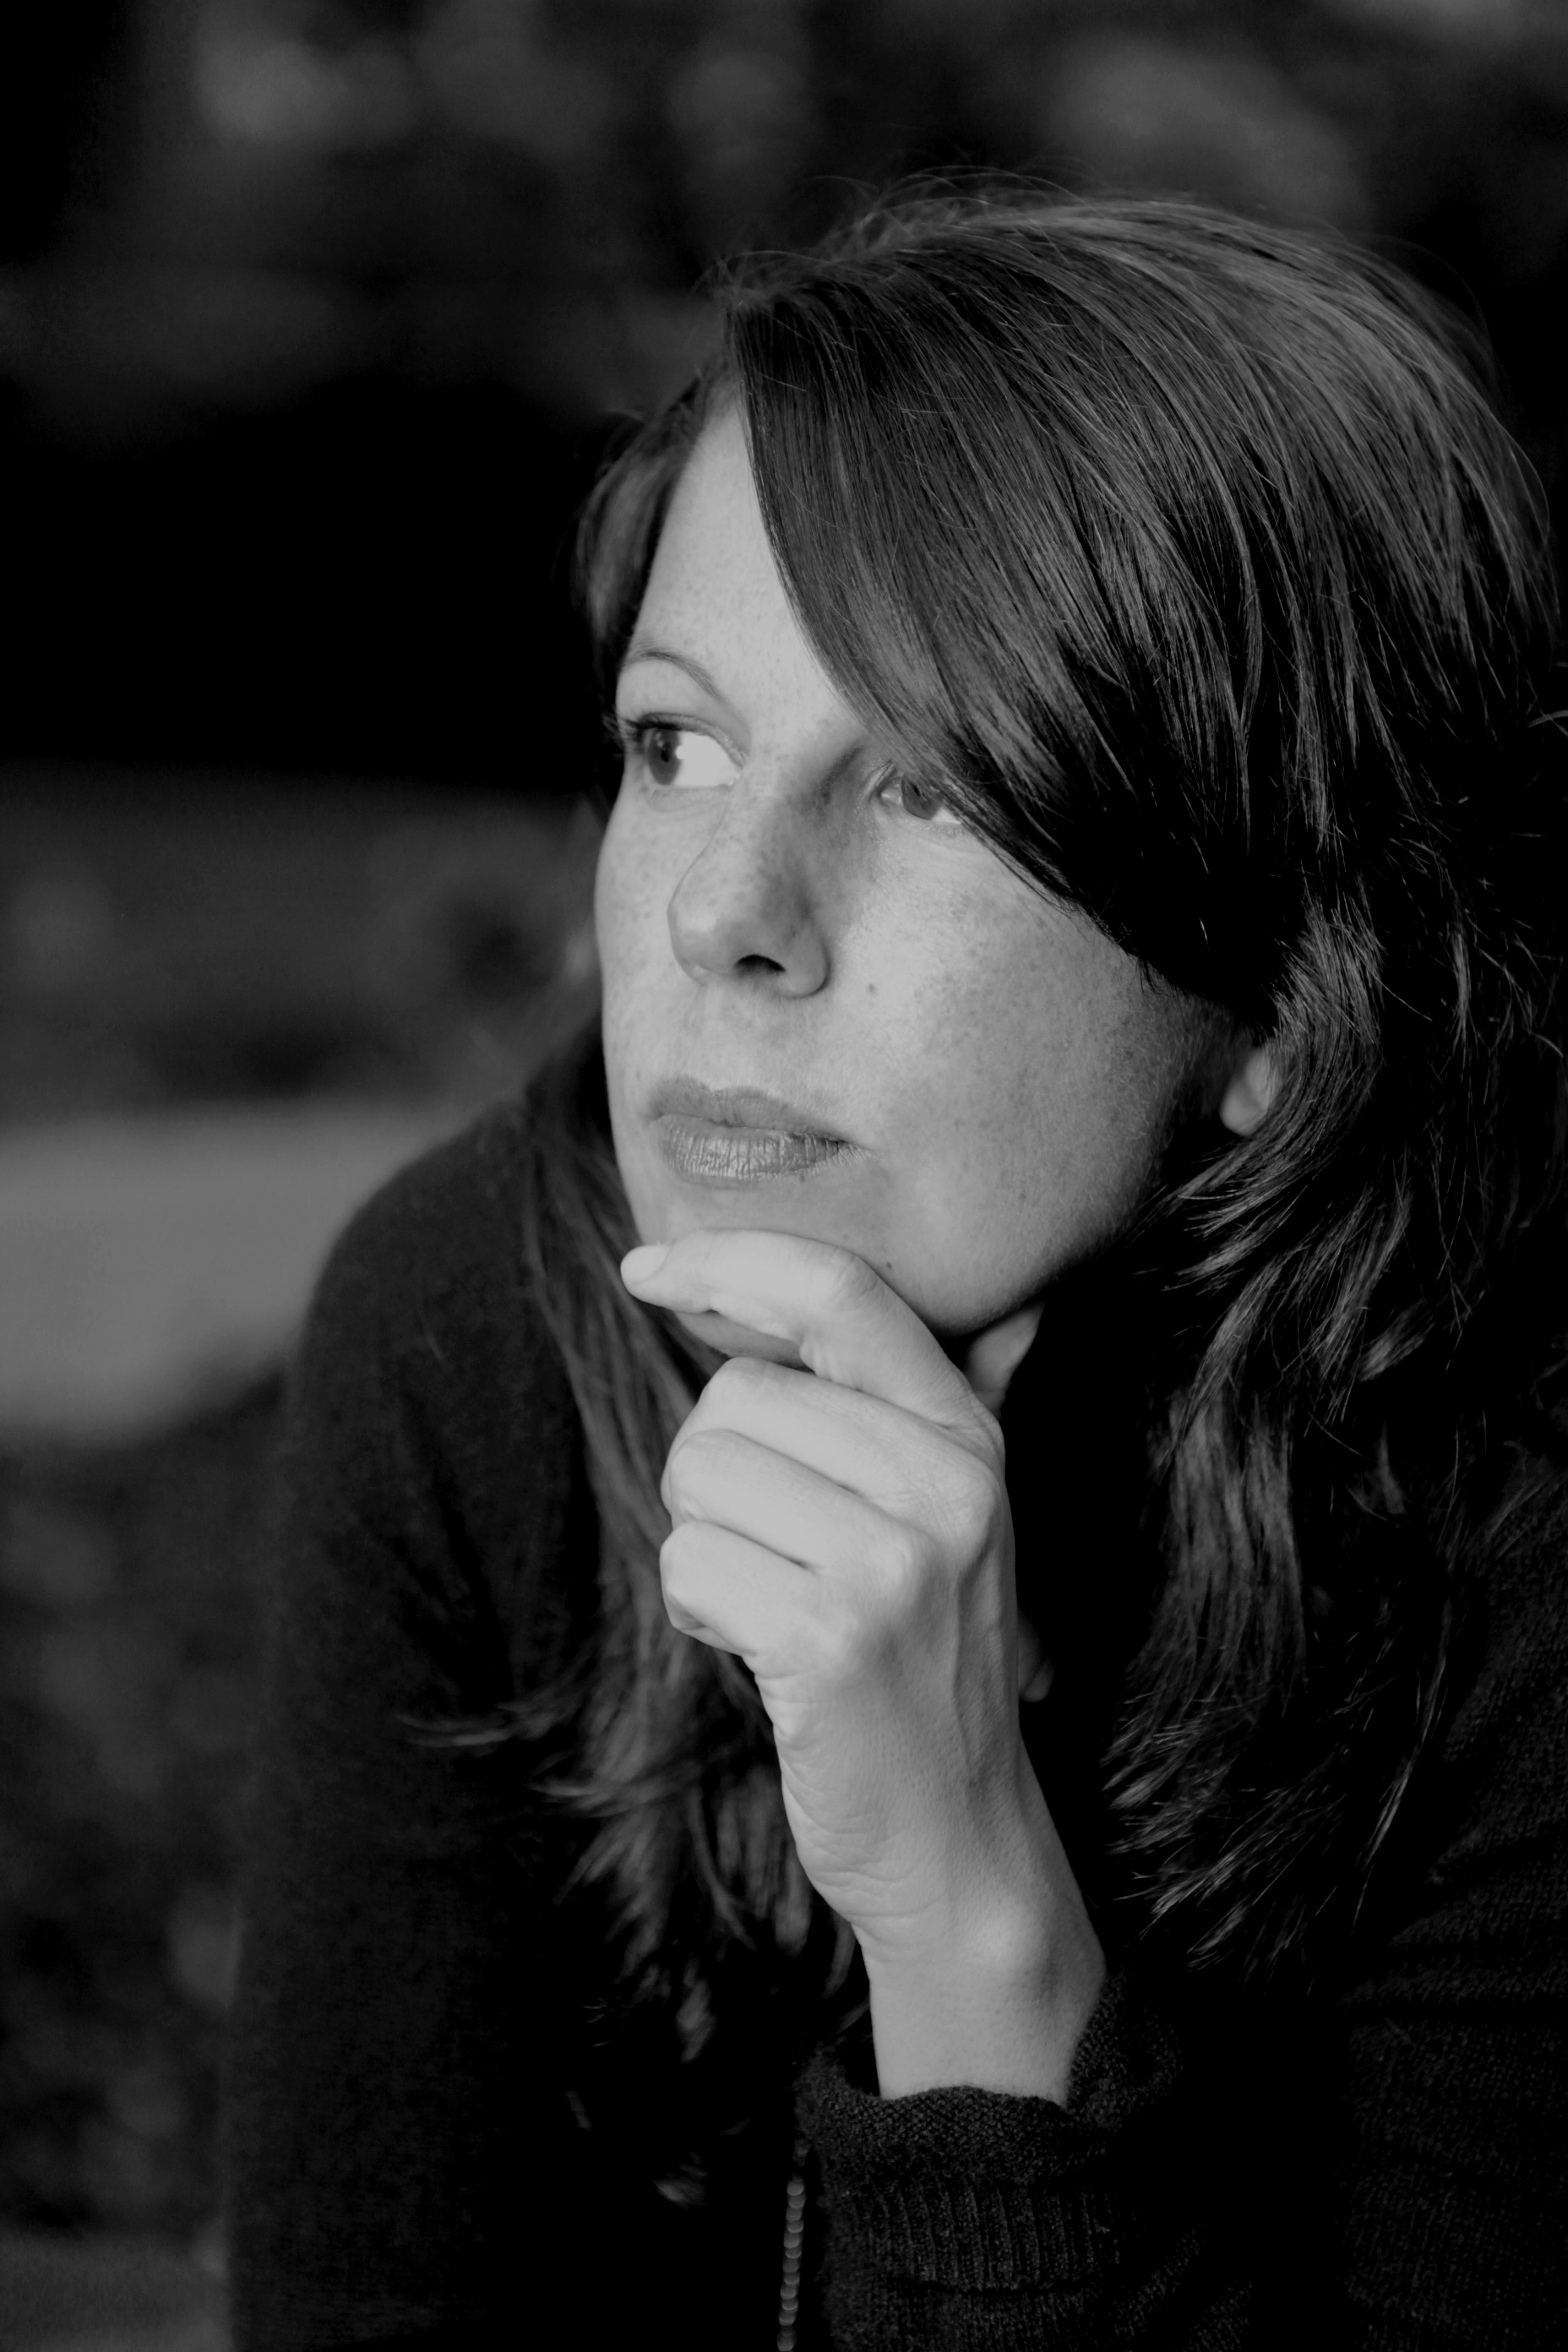 Author photo by  Graham Lott